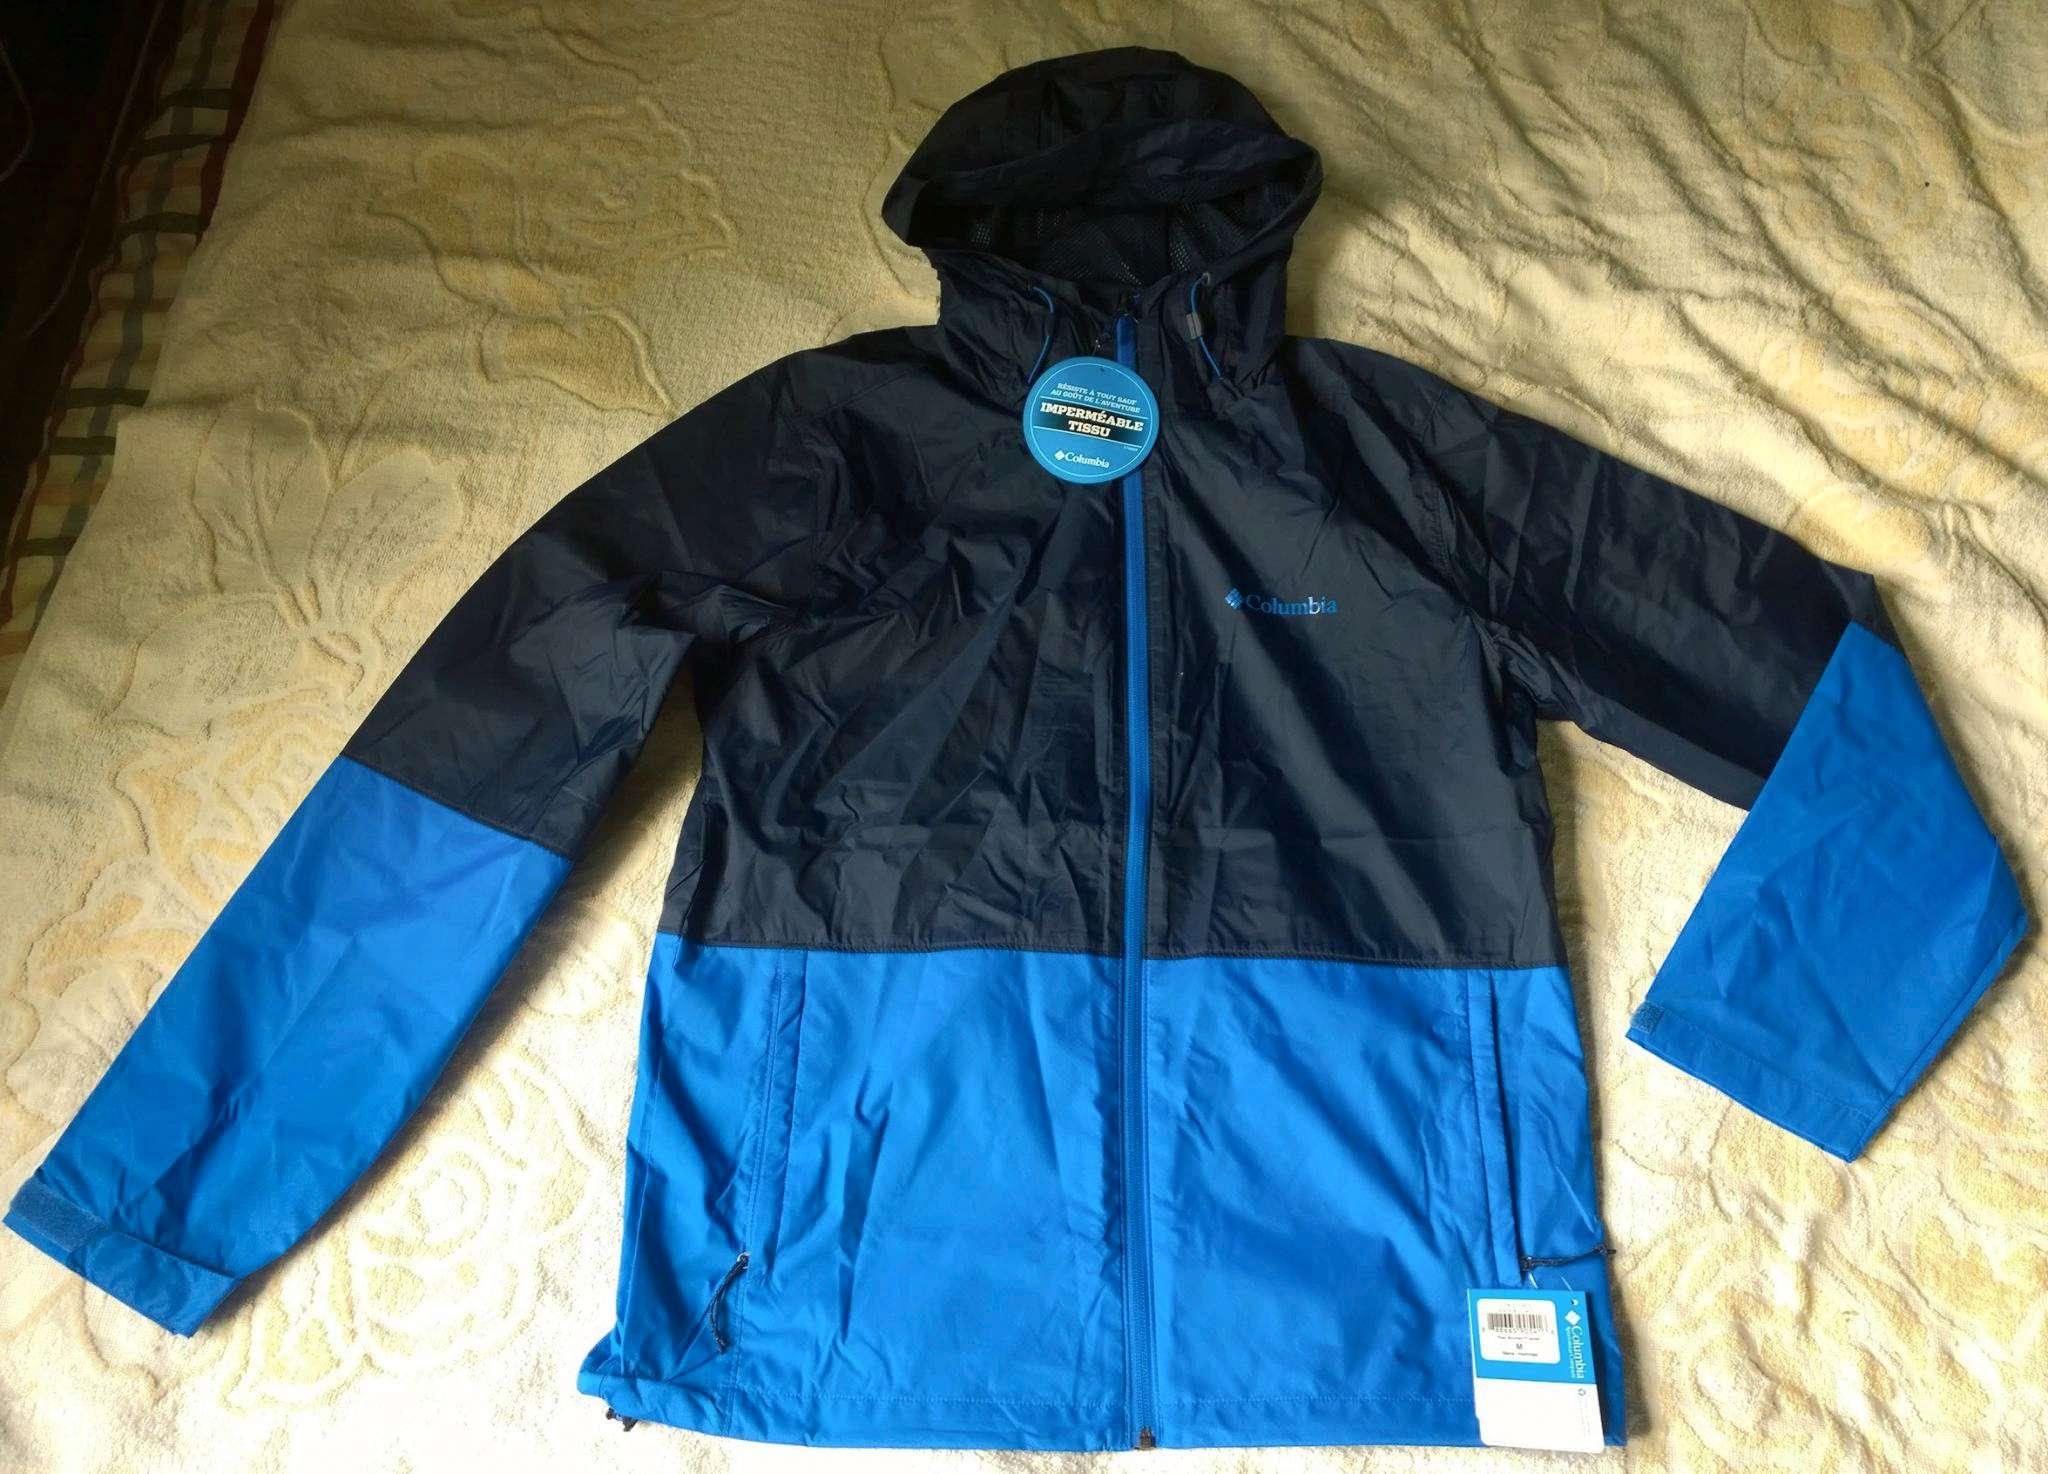 04ee18c2eed3 Ветровка Columbia 1580231-465 мужская, цвет синий, рус. размер 46-48 ...